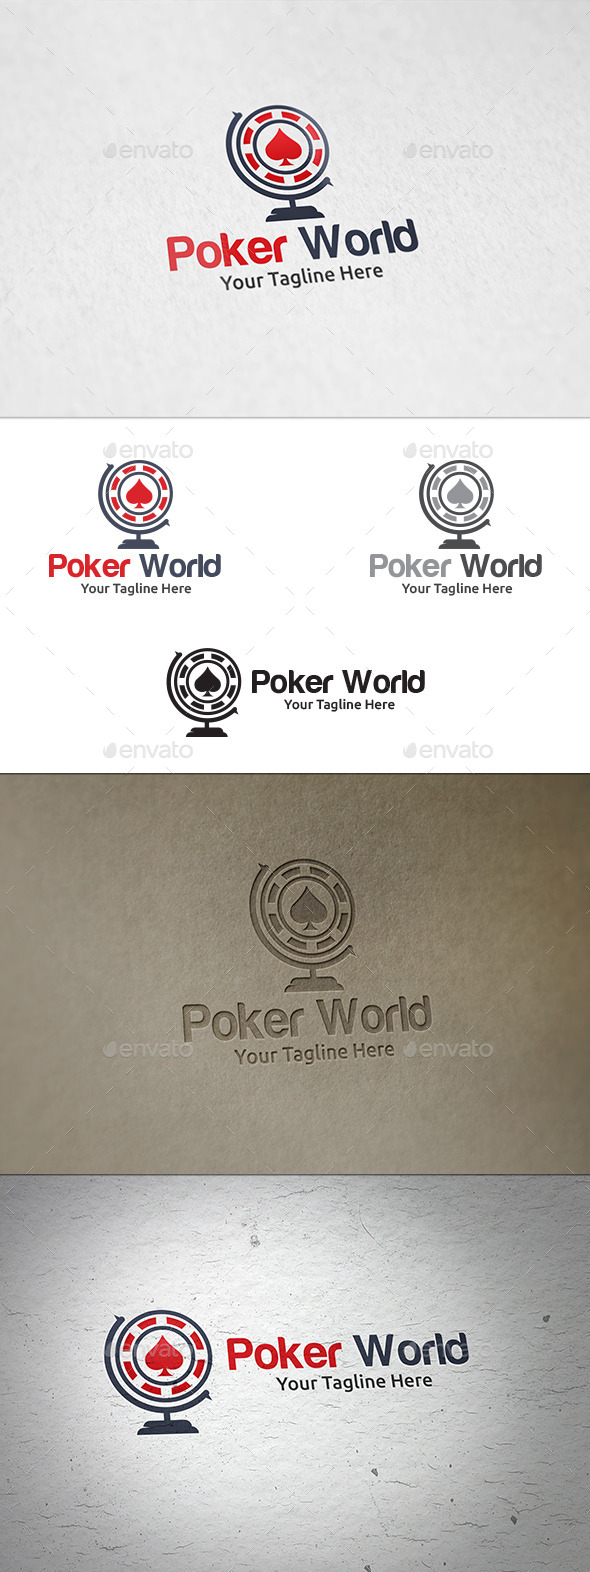 Poker World - Logo Template